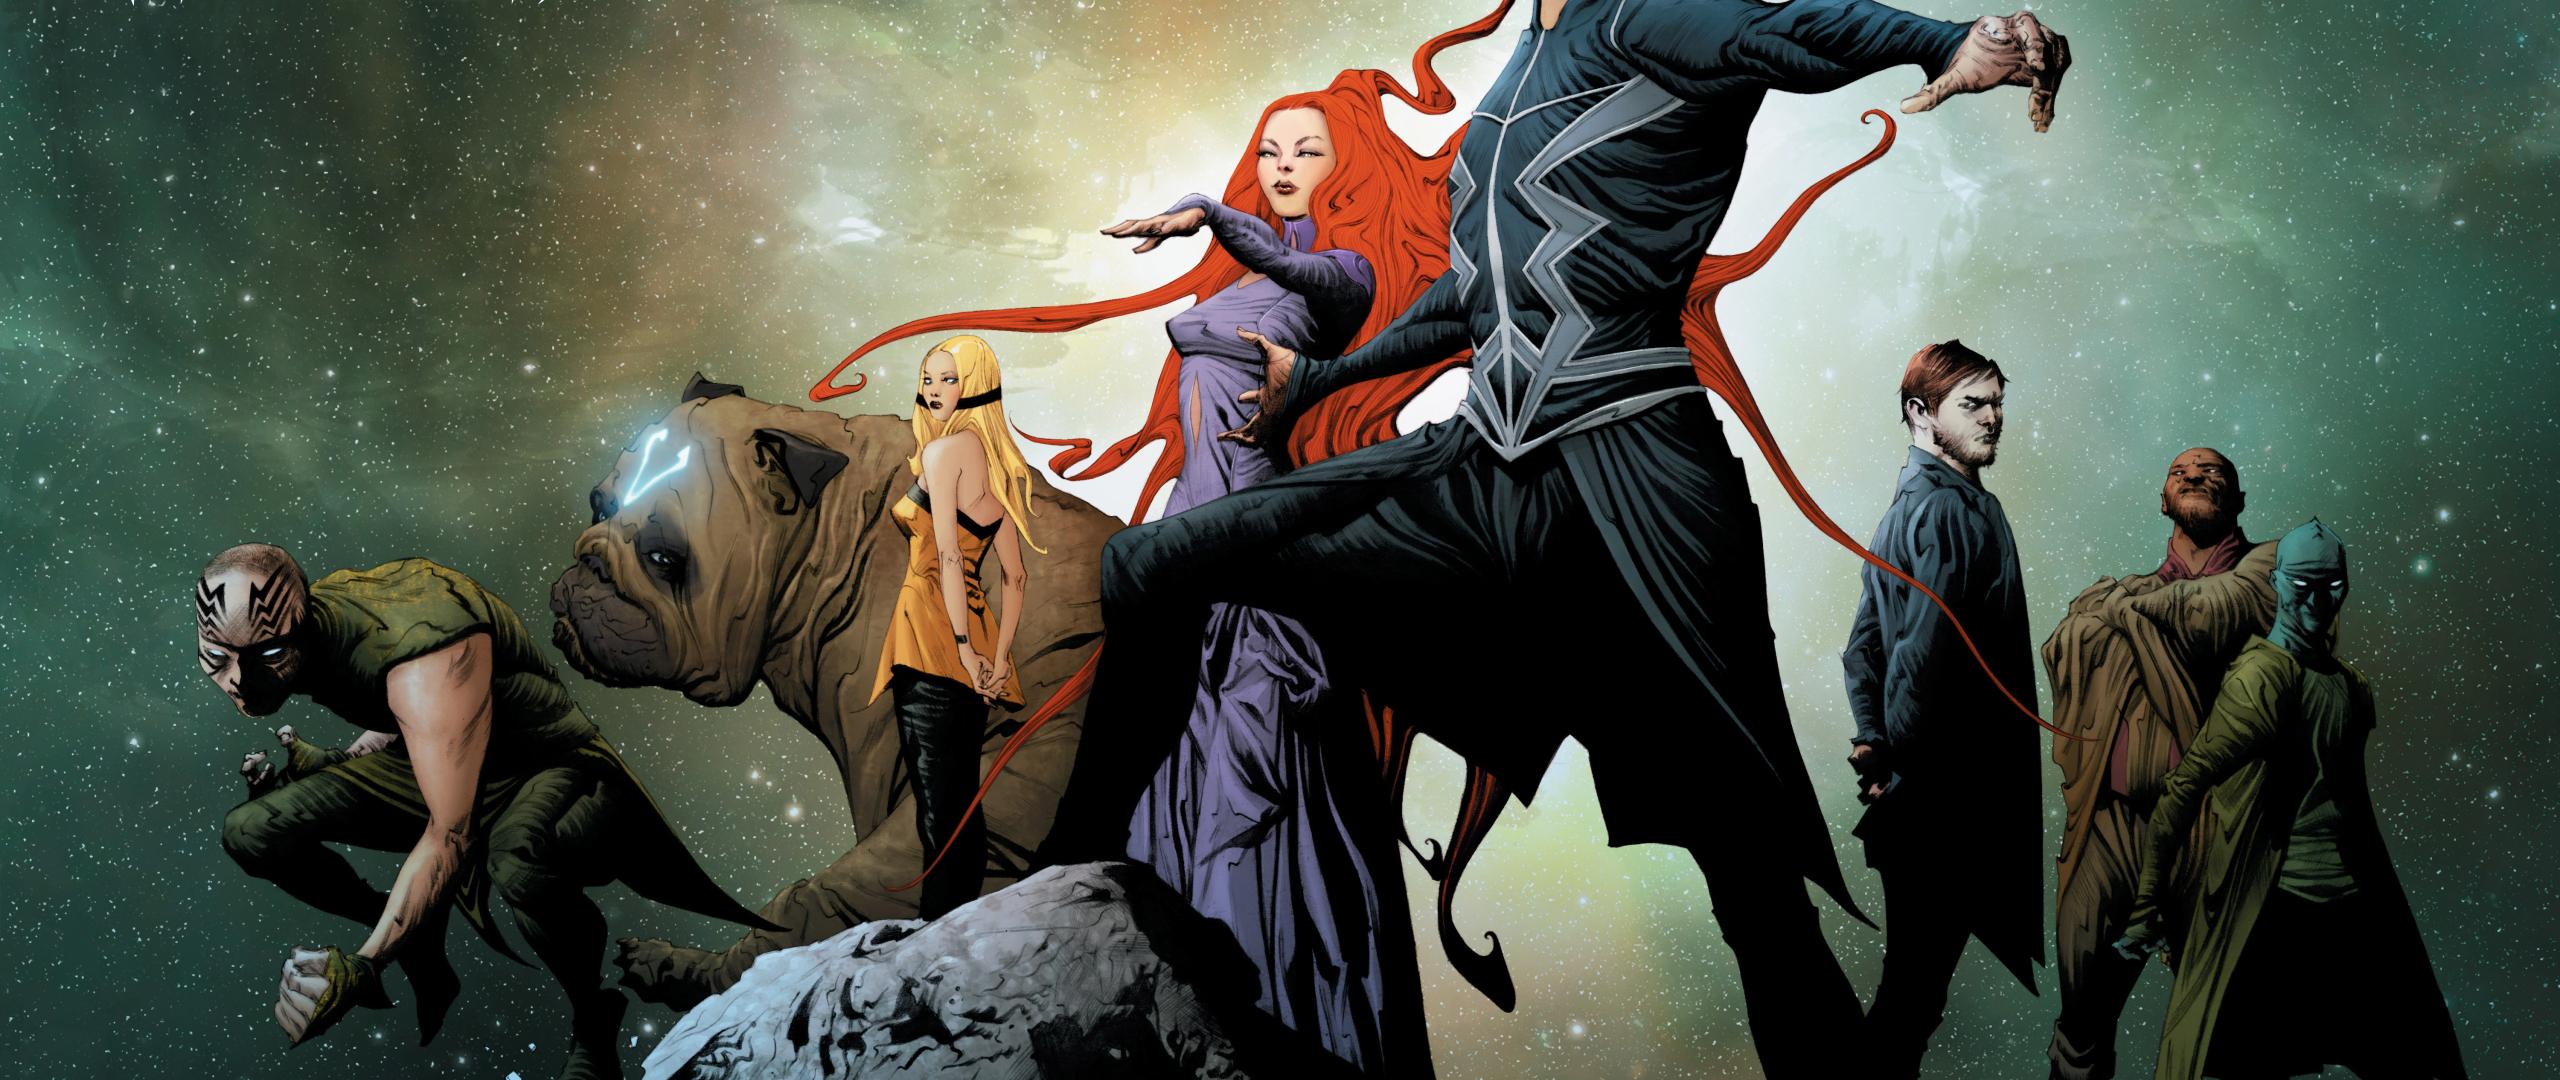 Marvel Inhumans Artwork Poster Hd 8k Wallpaper